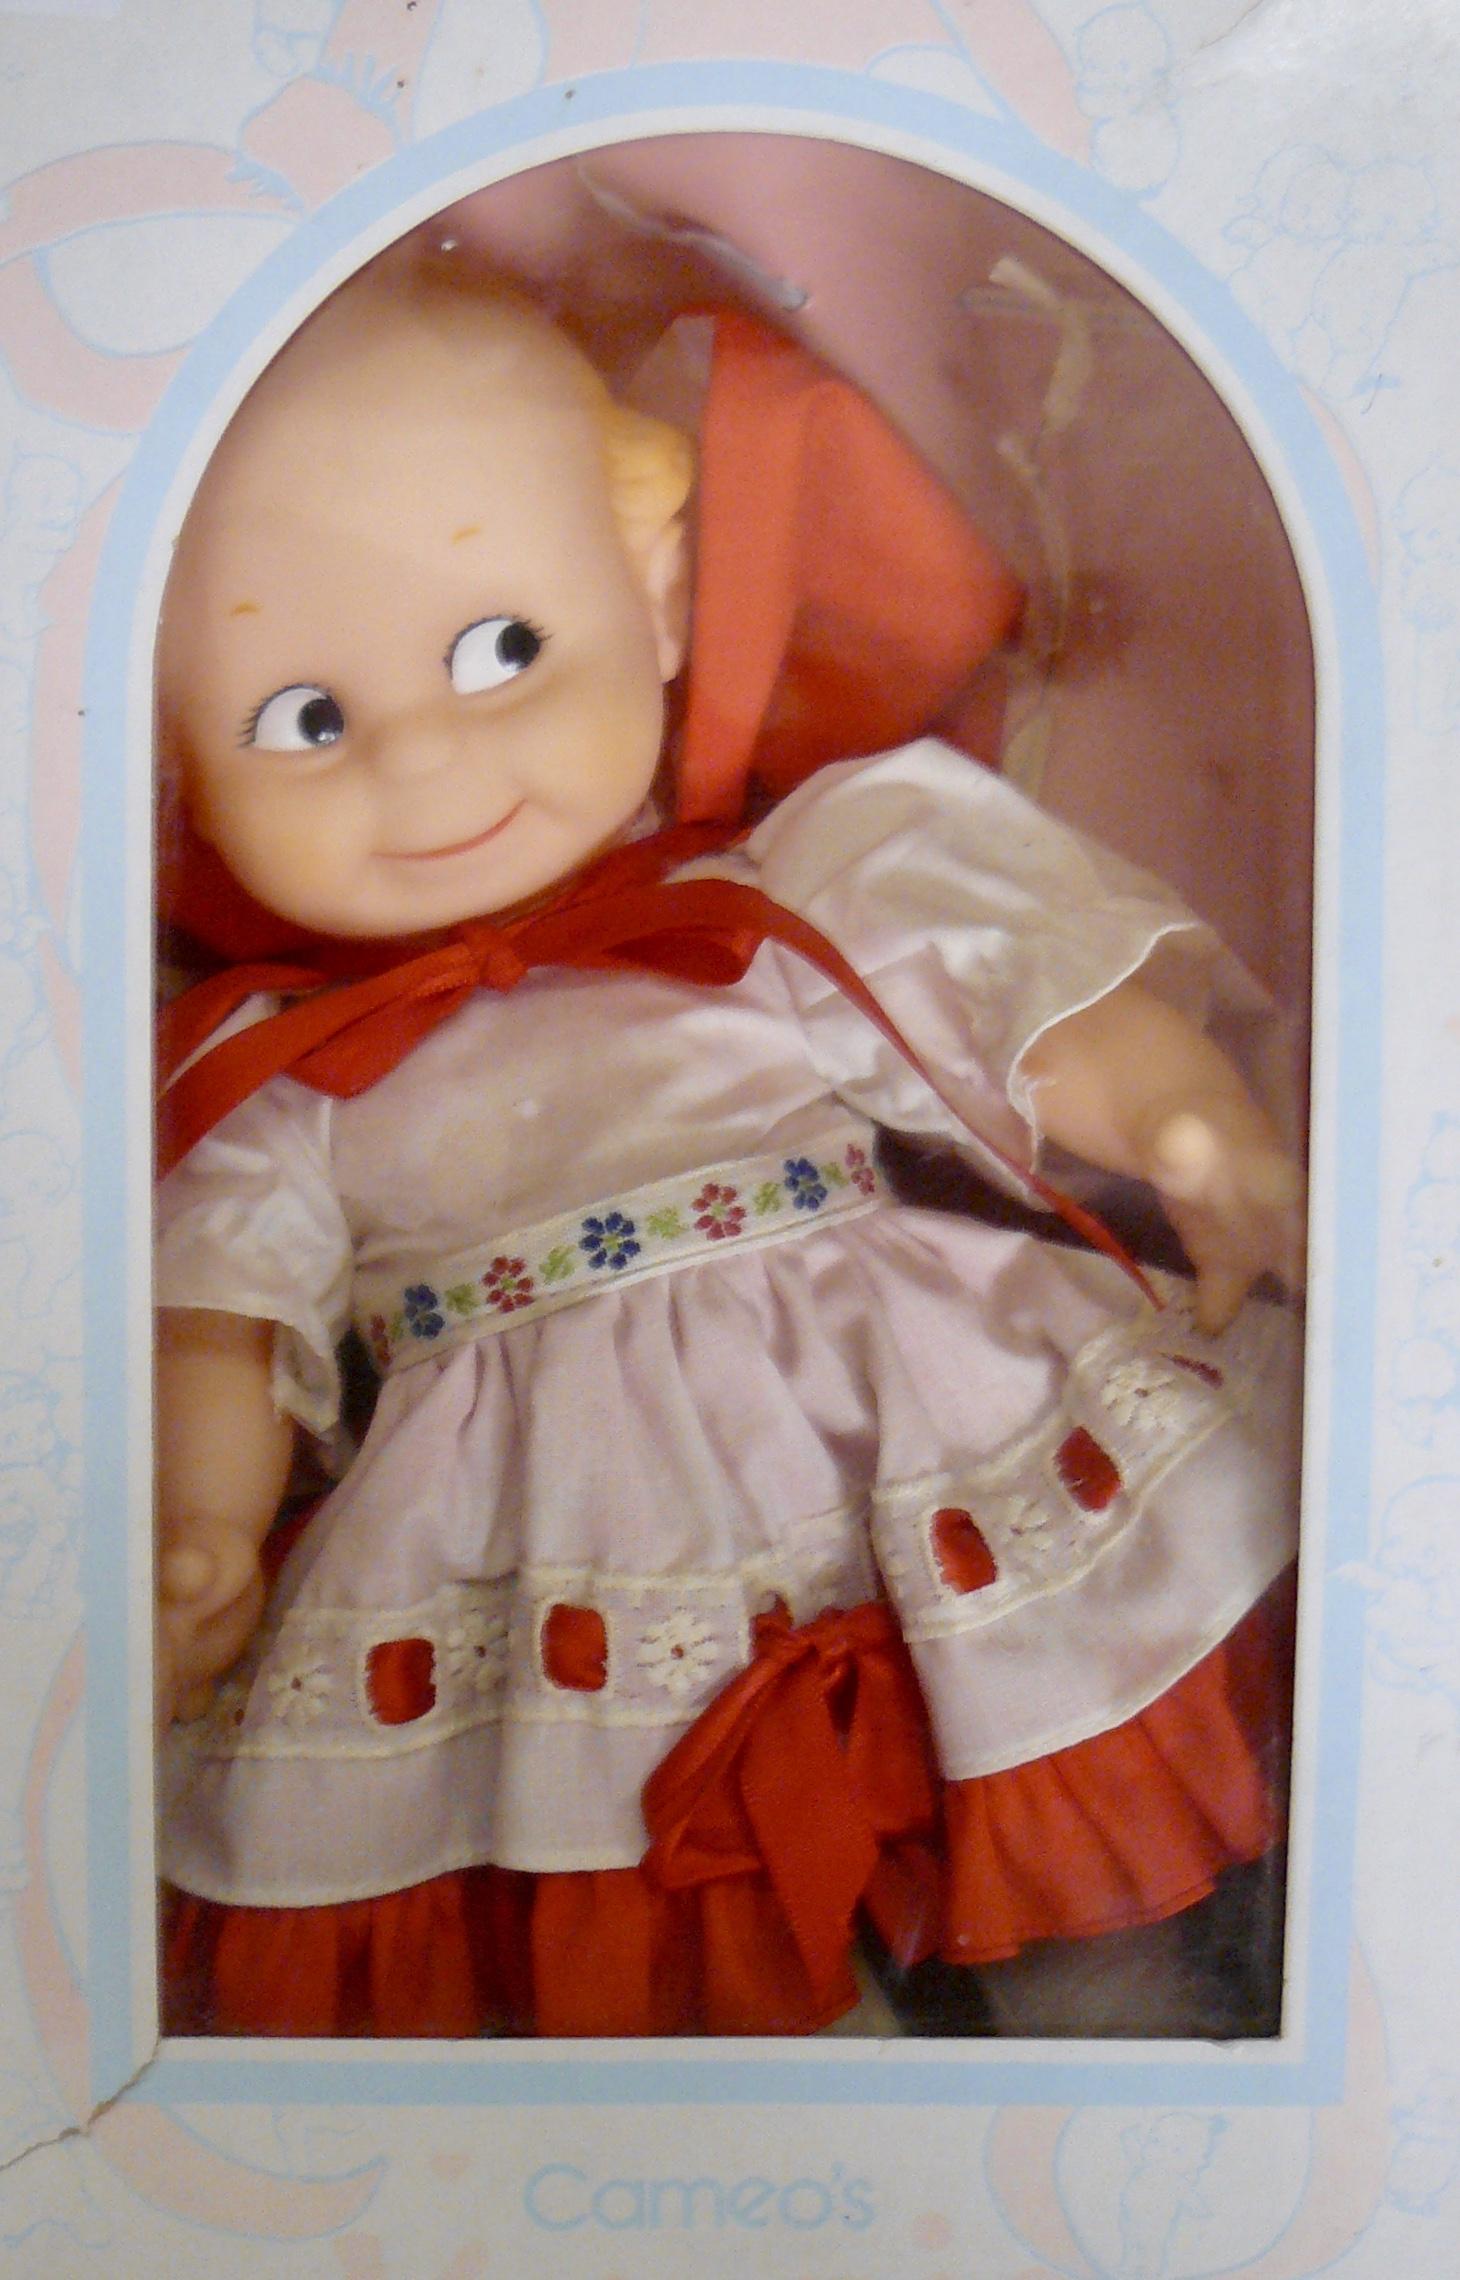 Cameo Kewpie Doll W Box And Original Clothing U2013 Booth 32, $65.00.